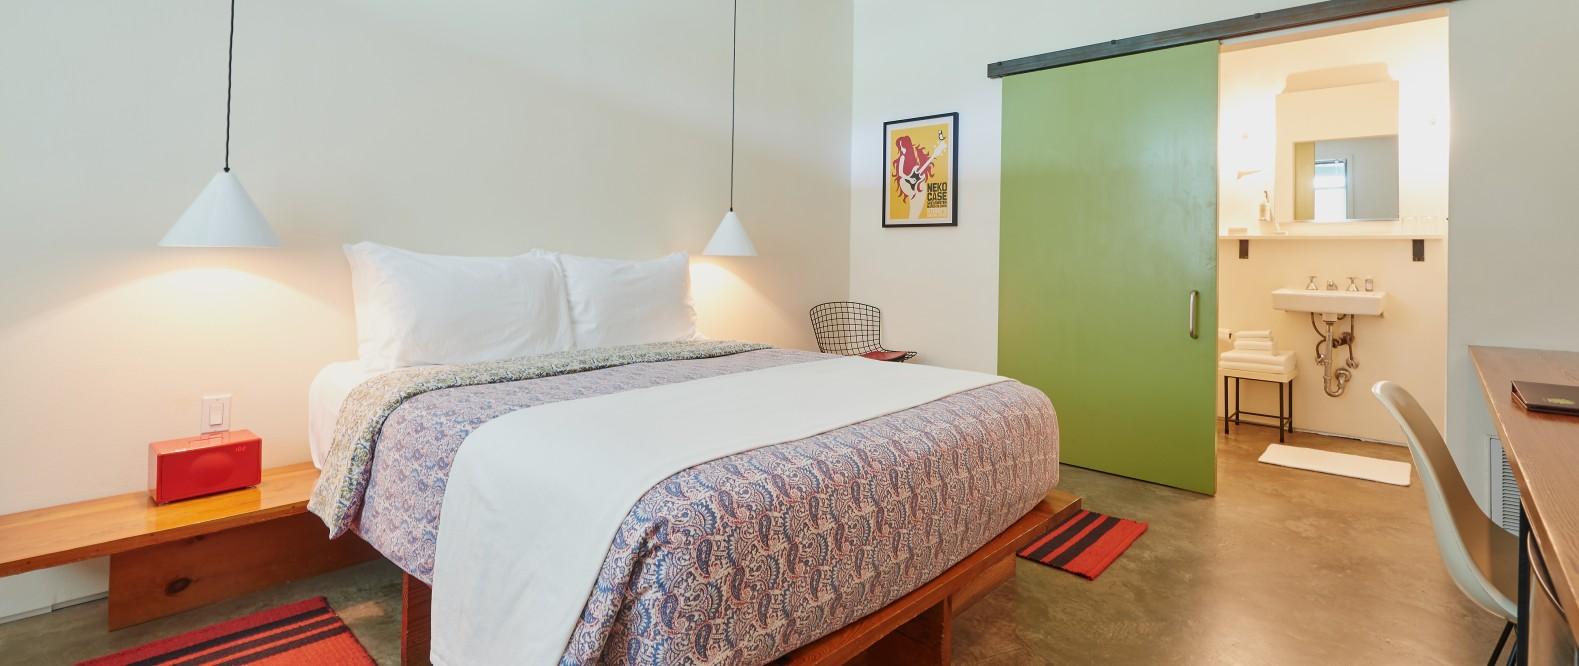 Image courtesy of the Hotel San Jose